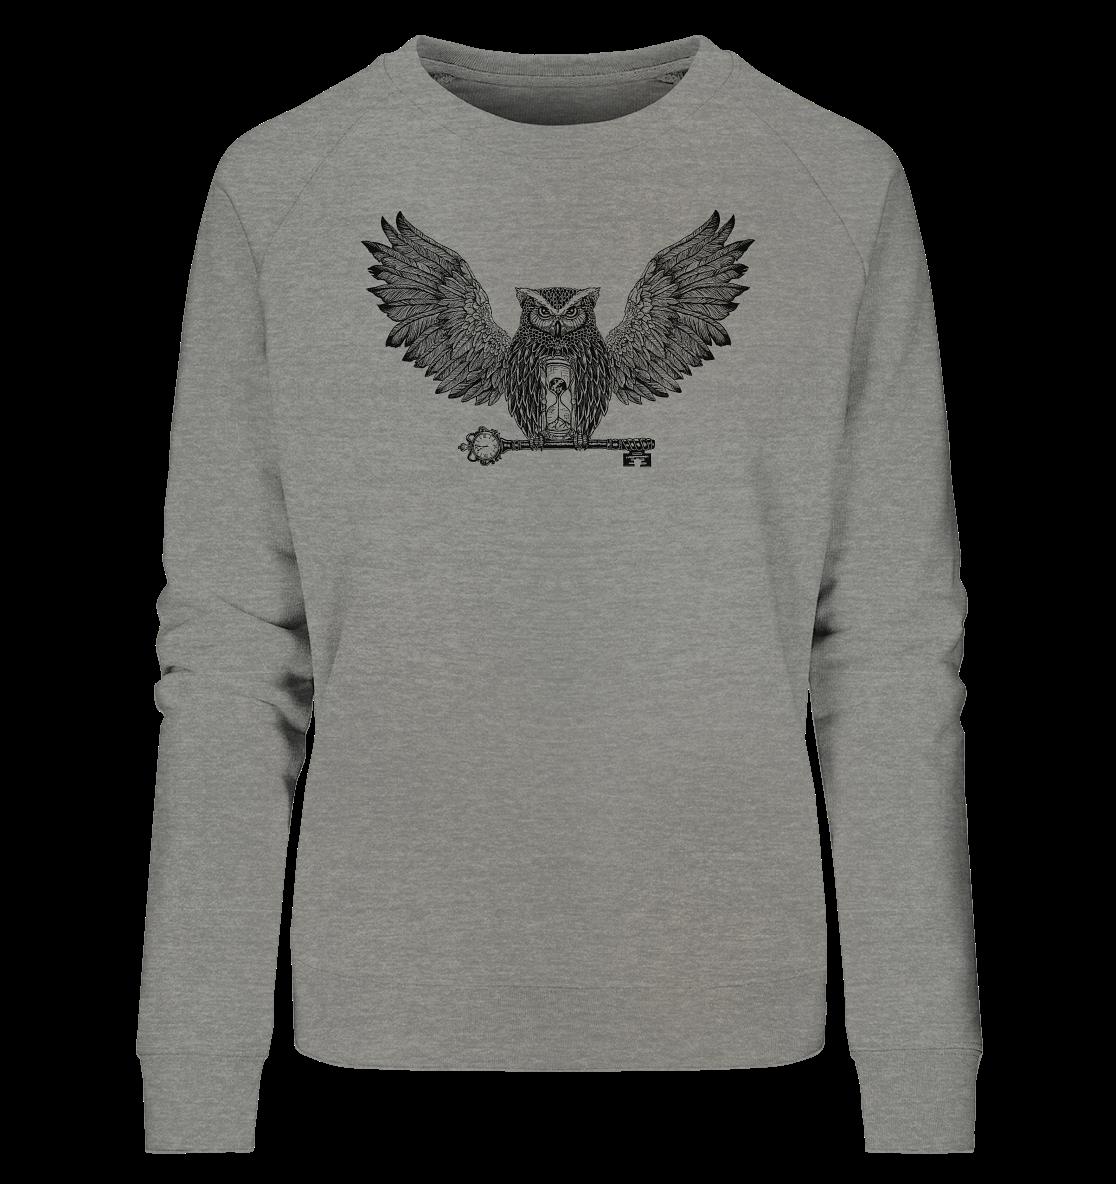 front-ladies-organic-sweatshirt-818381-1116x-10.png